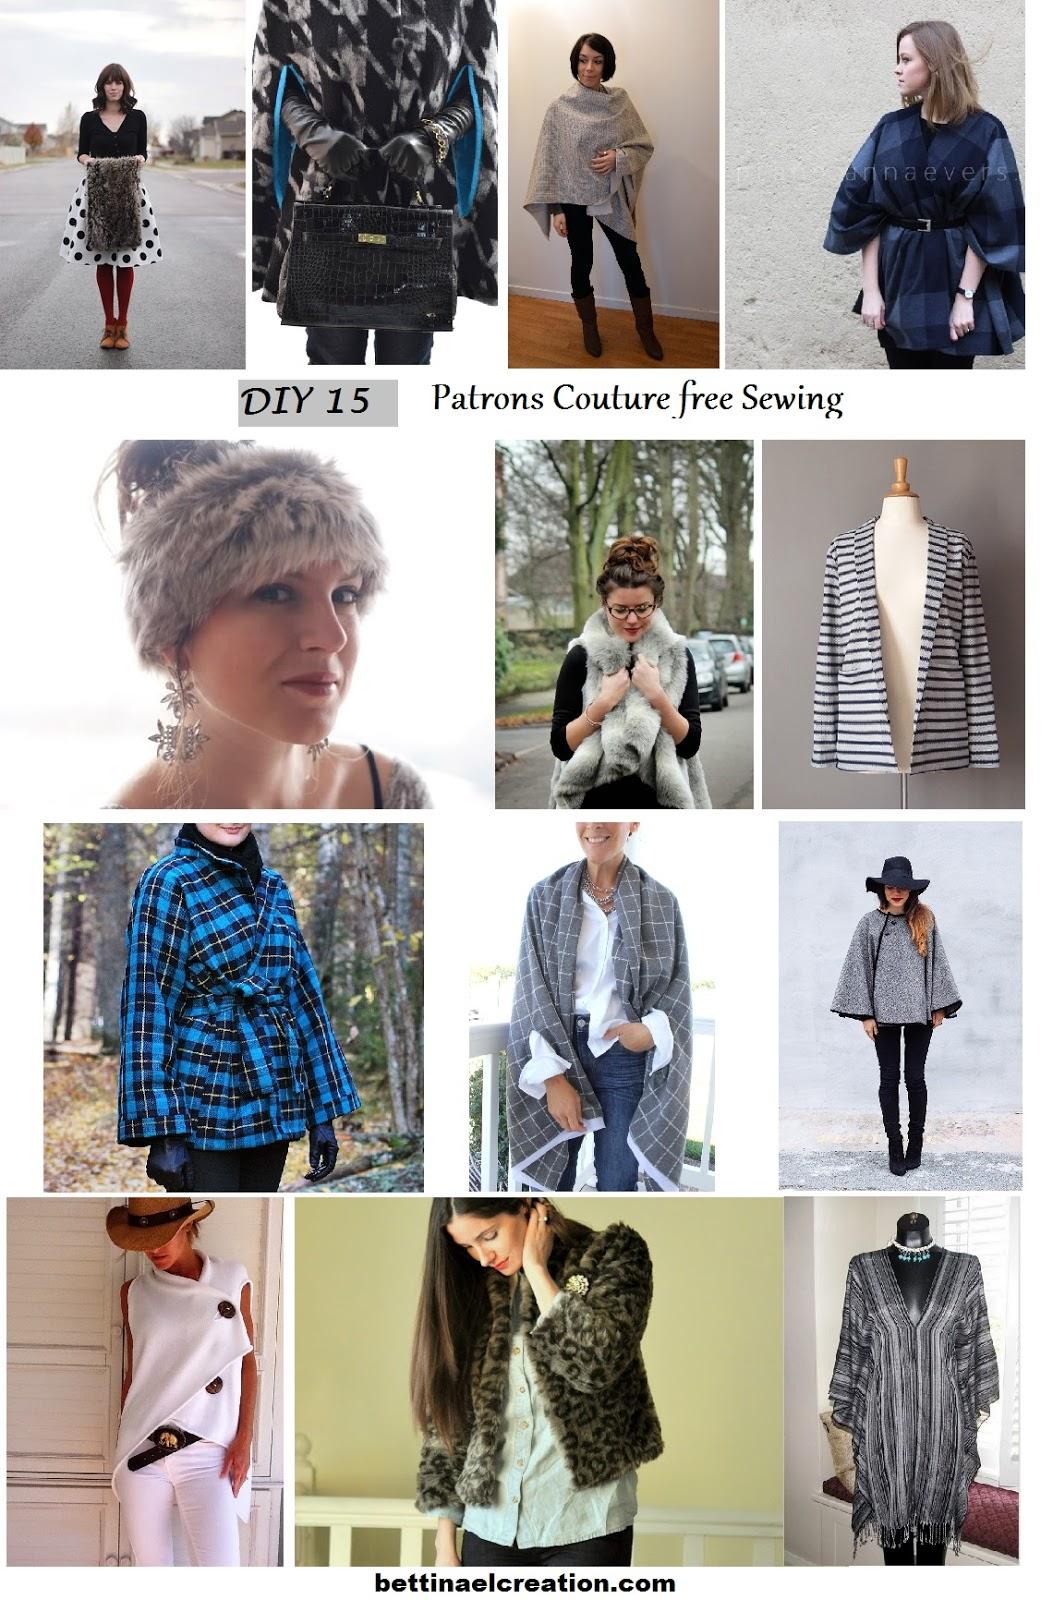 Diy 15 id es de couture saison automne hiver bettinael passion couture made in france - Diy couture facile ...